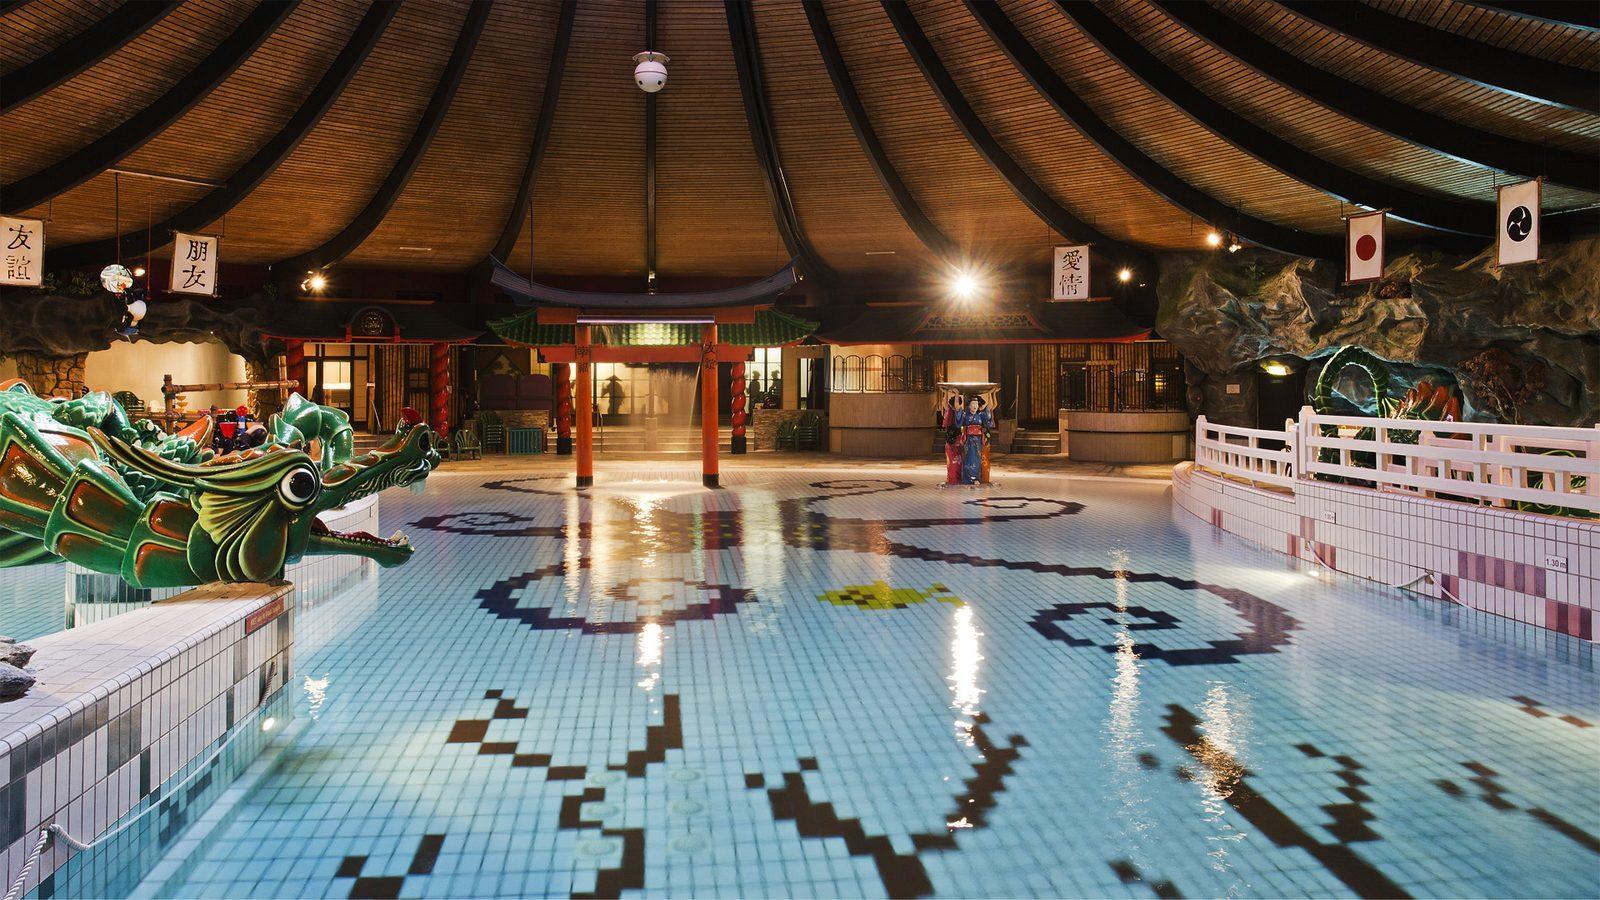 Swimming paradise De Bonte Wever